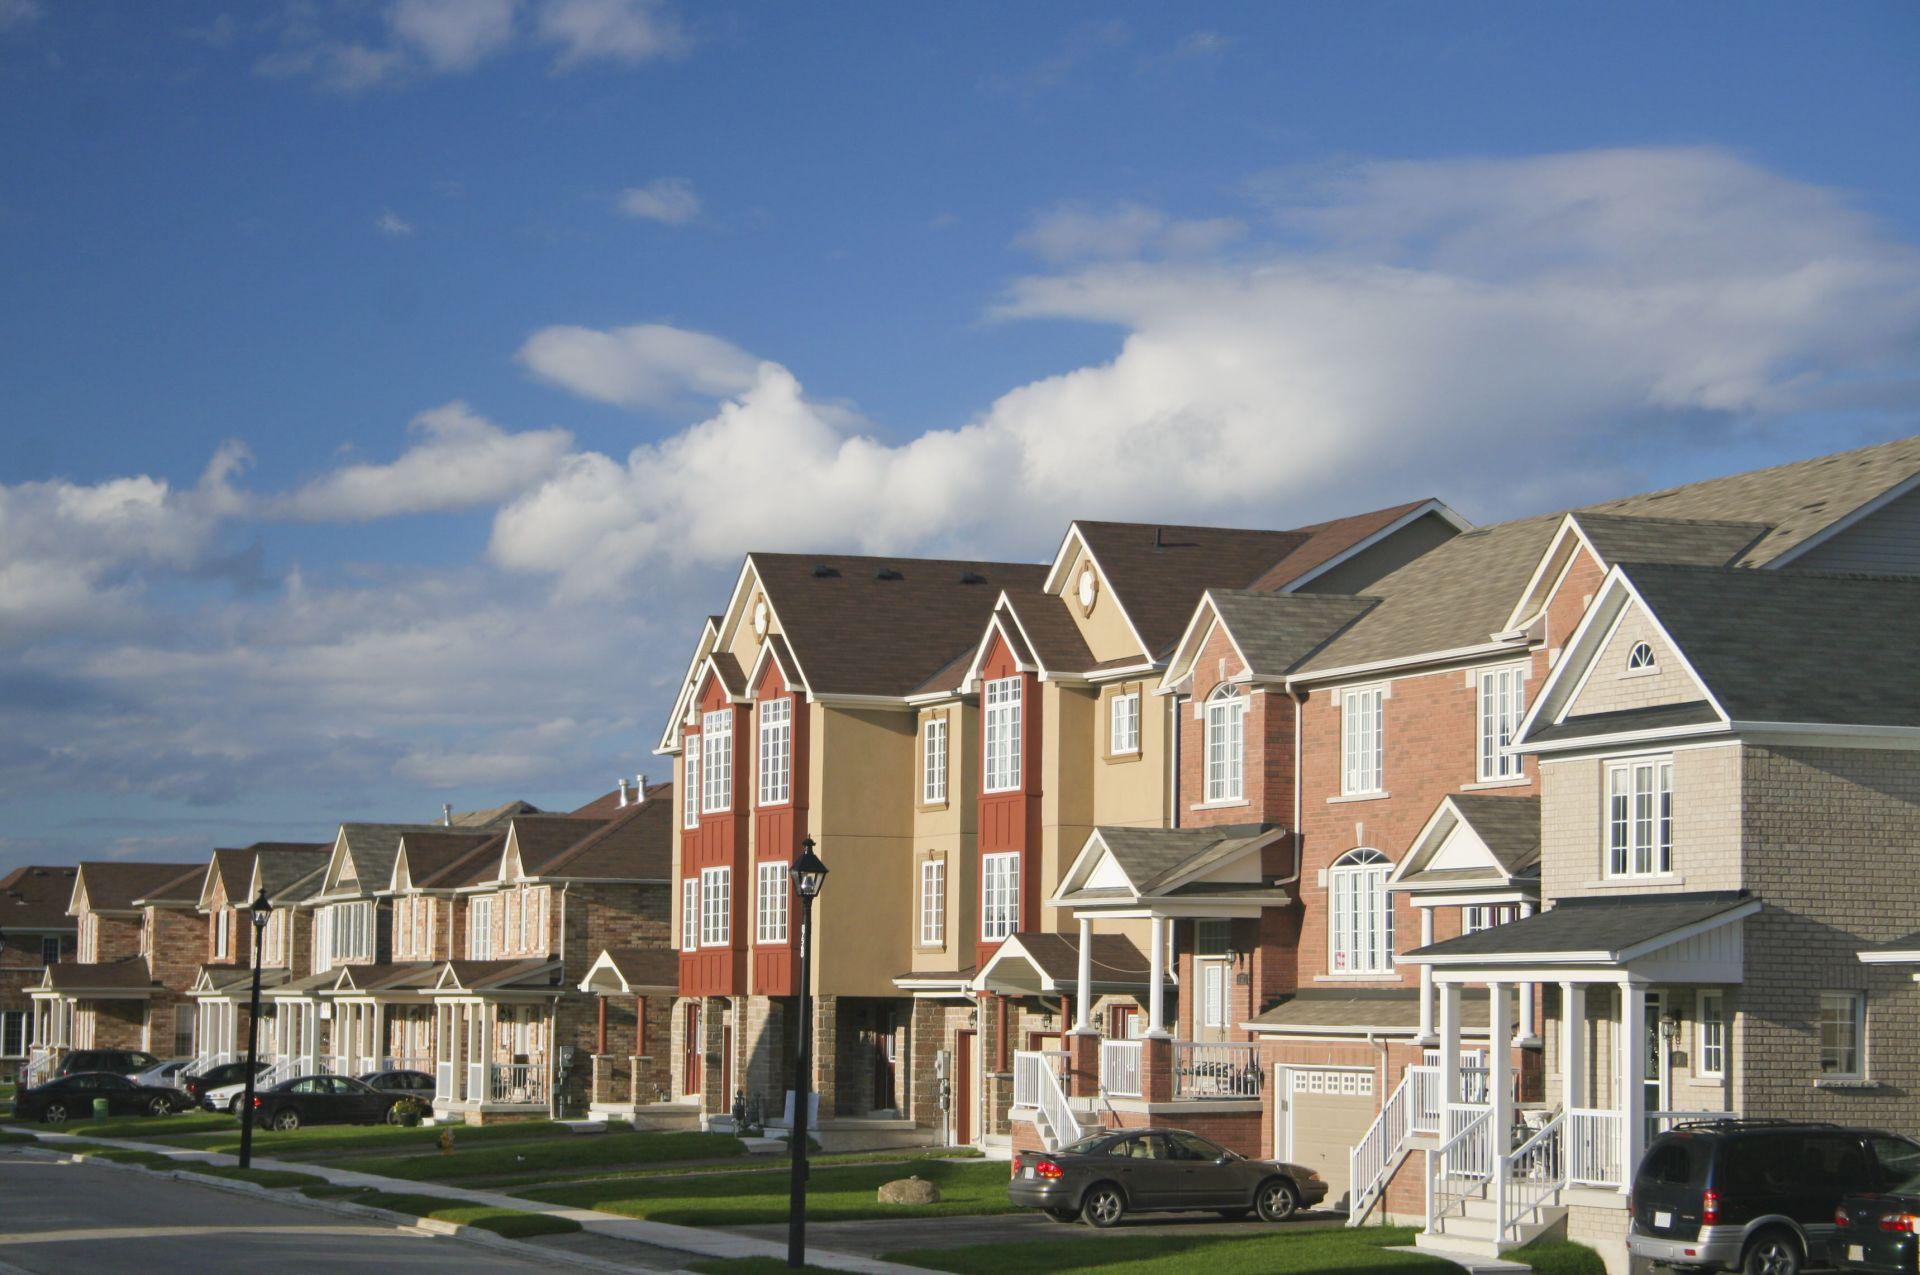 Choosing the Right Ridgefield Neighborhood